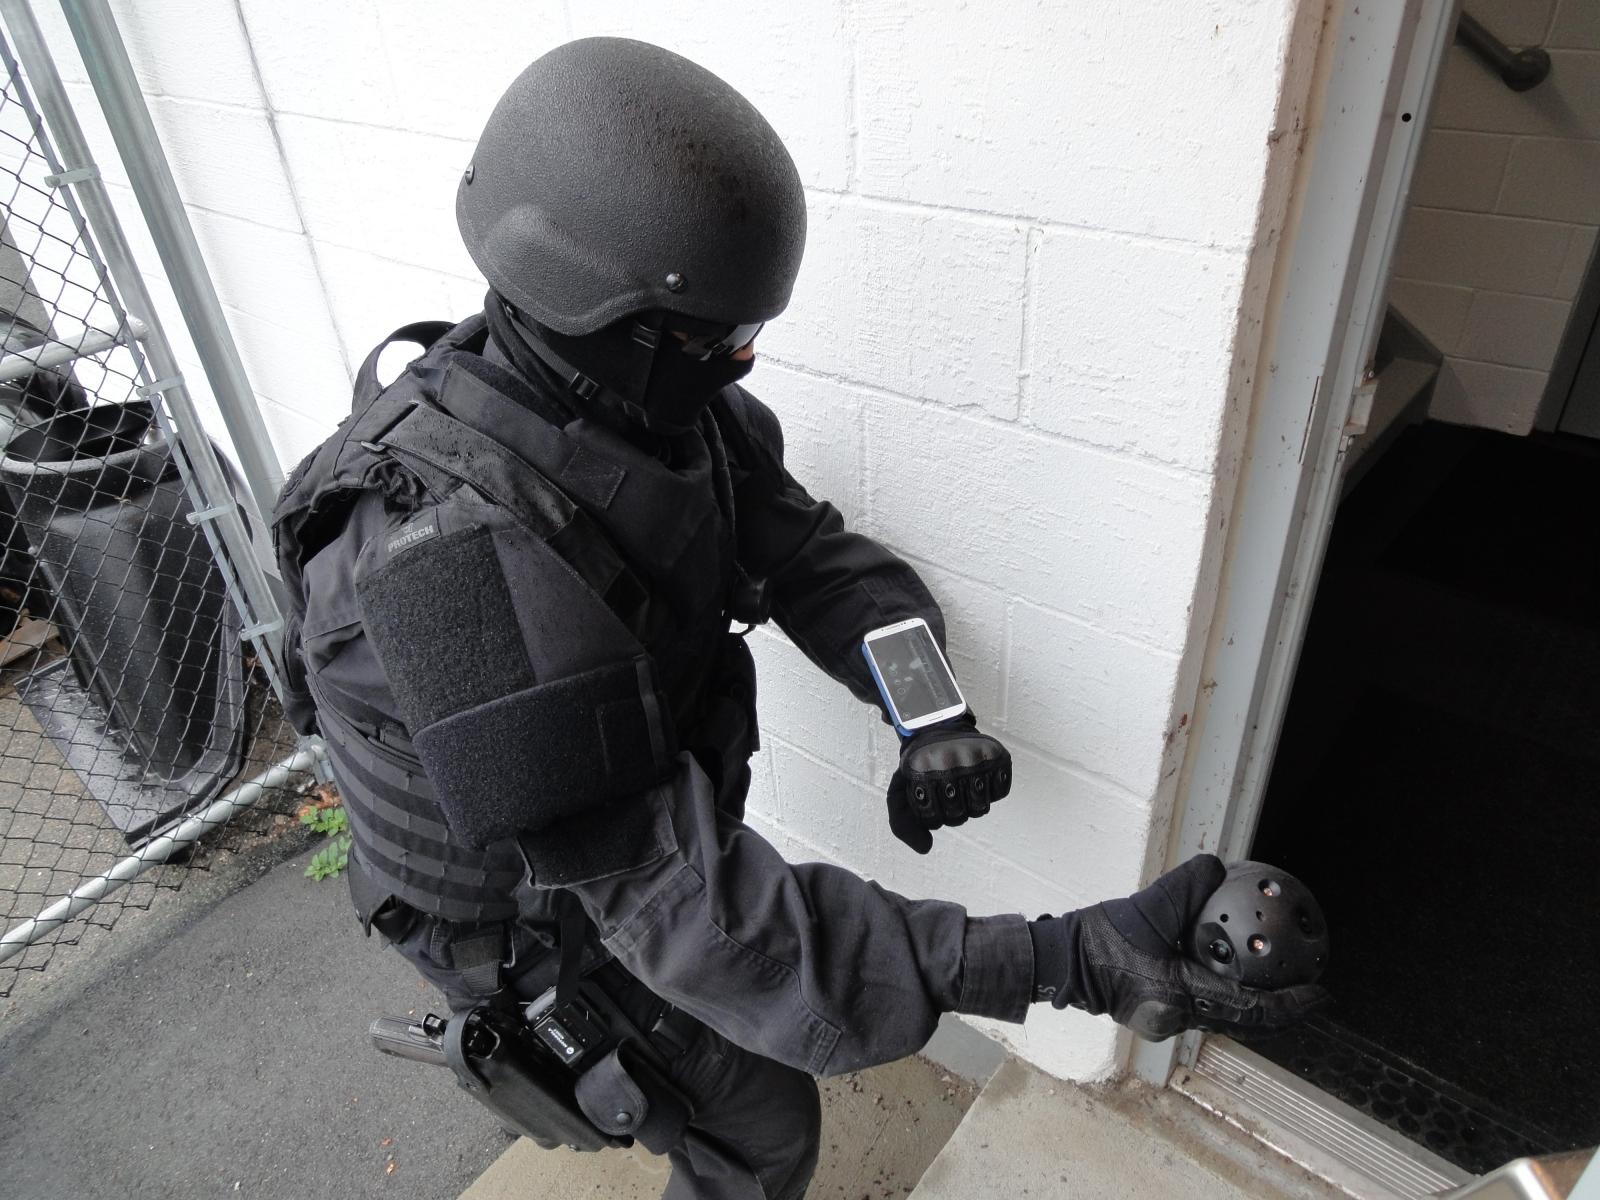 Bounce Imaging Explorer camera ball for police